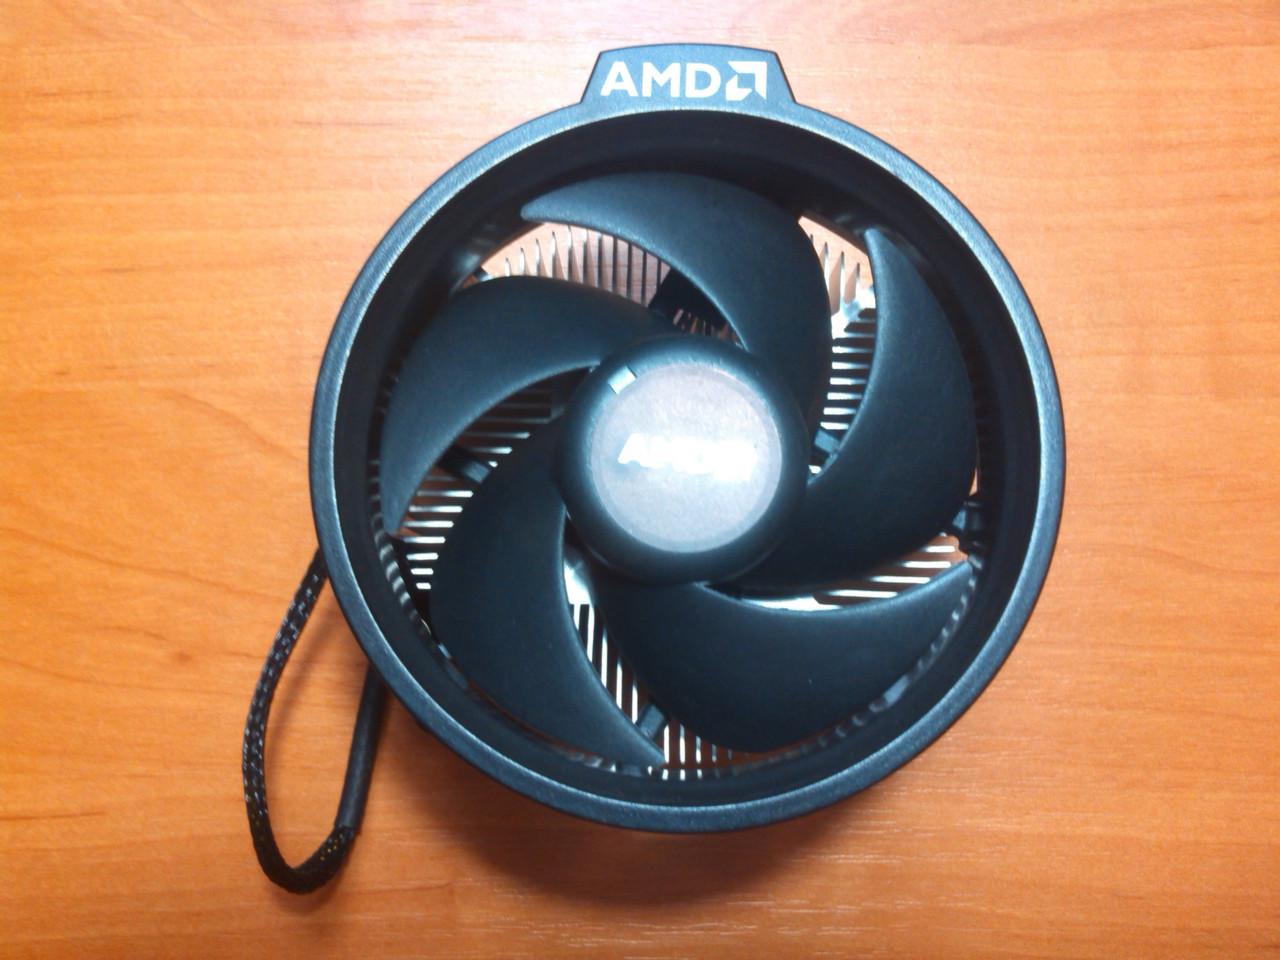 Кулер AMD на AM4 сокет TDP 110W Гарантія!